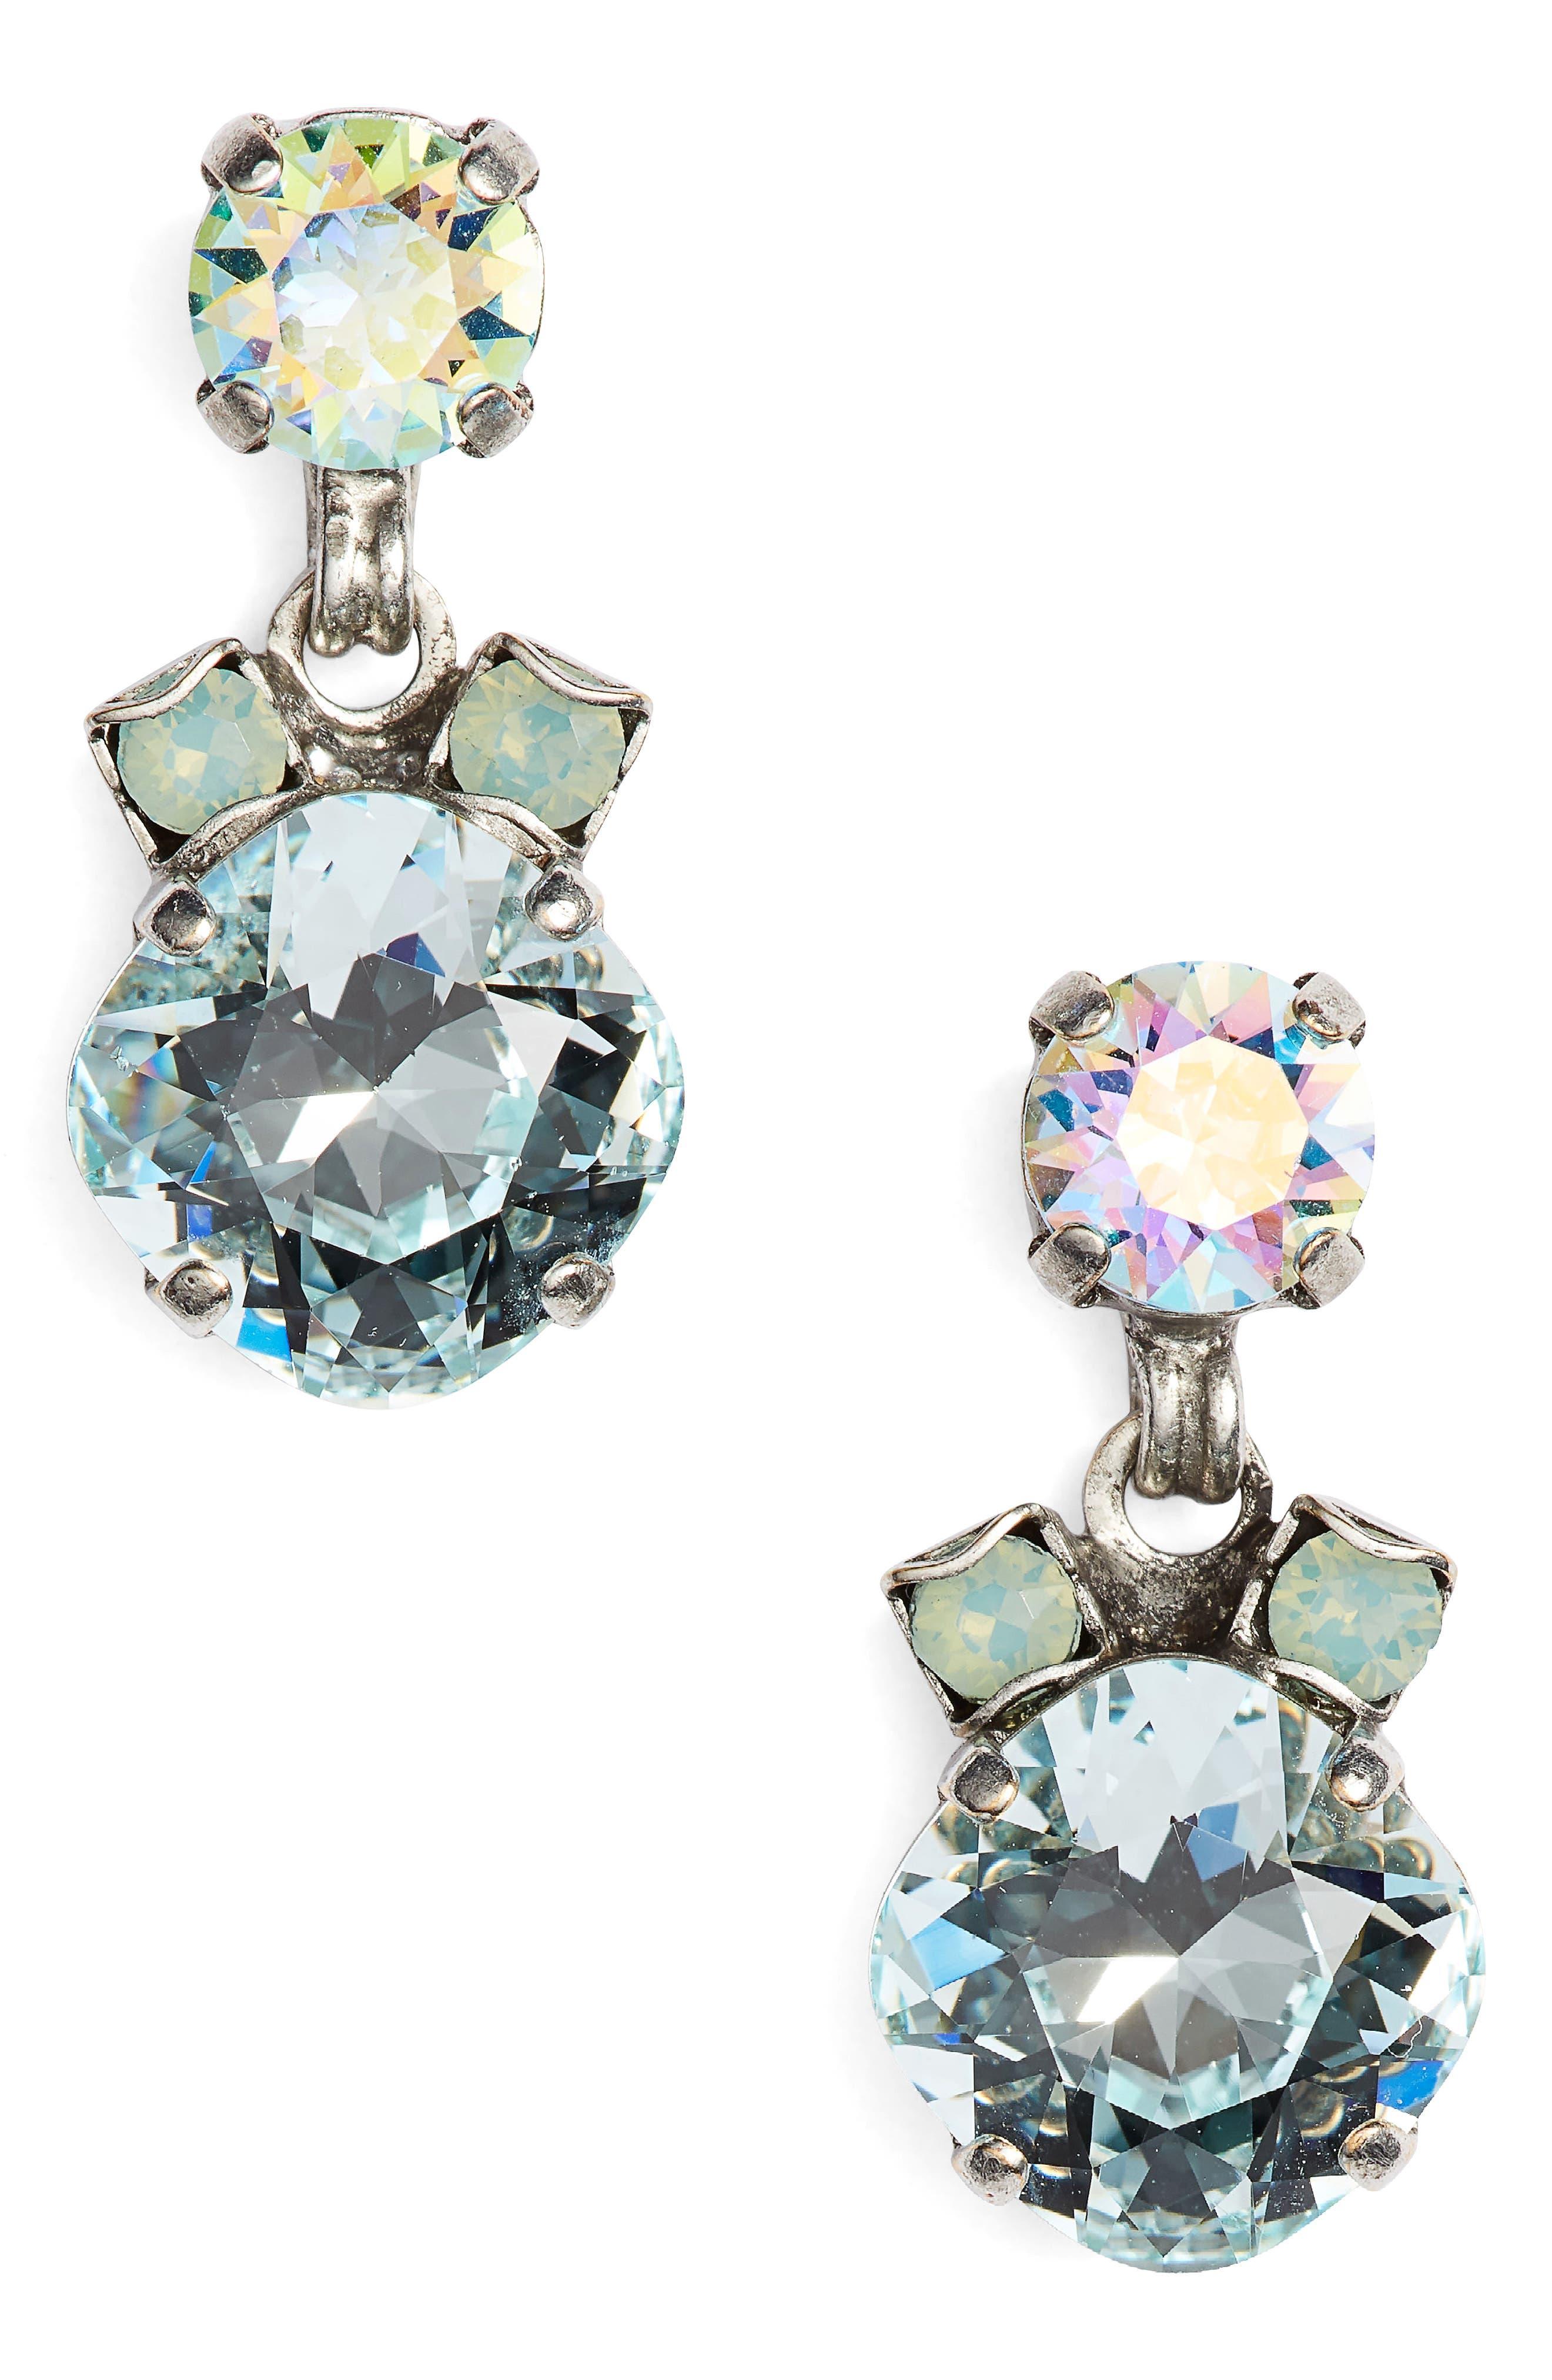 Balsam Crystal Drop Earrings,                             Main thumbnail 1, color,                             Blue-Green